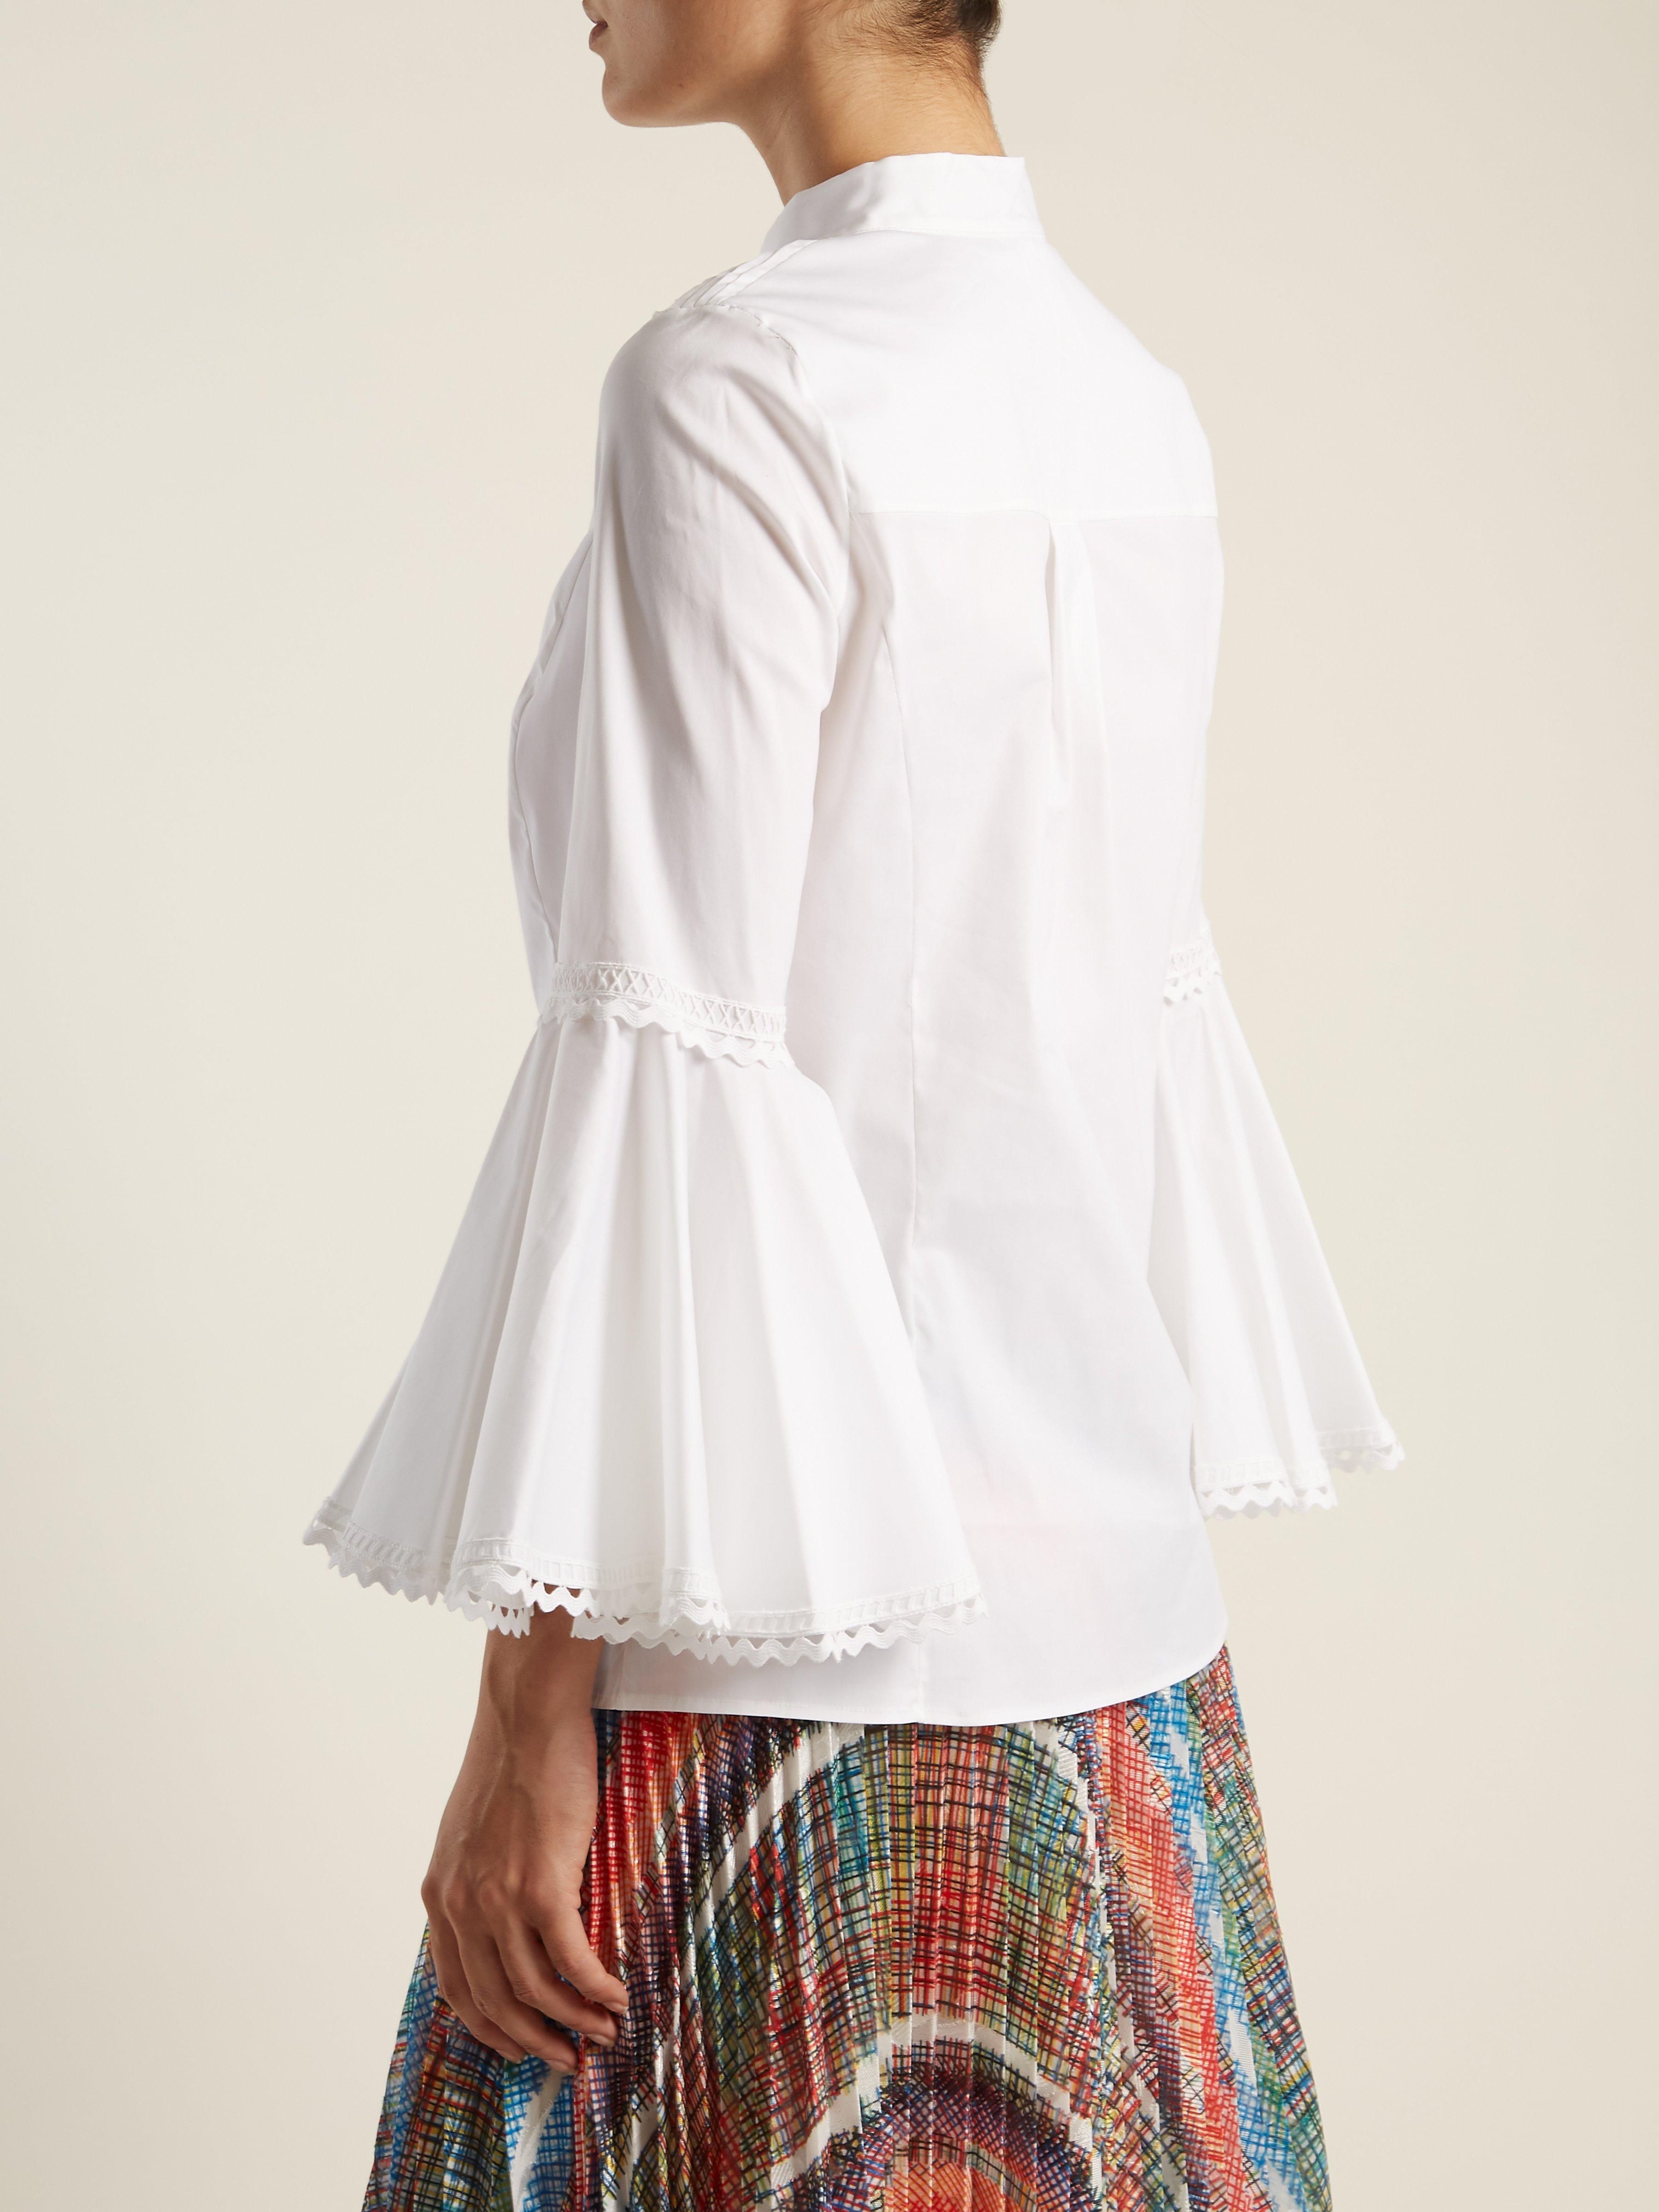 32513f40430749 Oscar de la Renta - White Rickrack Trimmed Cotton Blend Blouse - Lyst. View  fullscreen